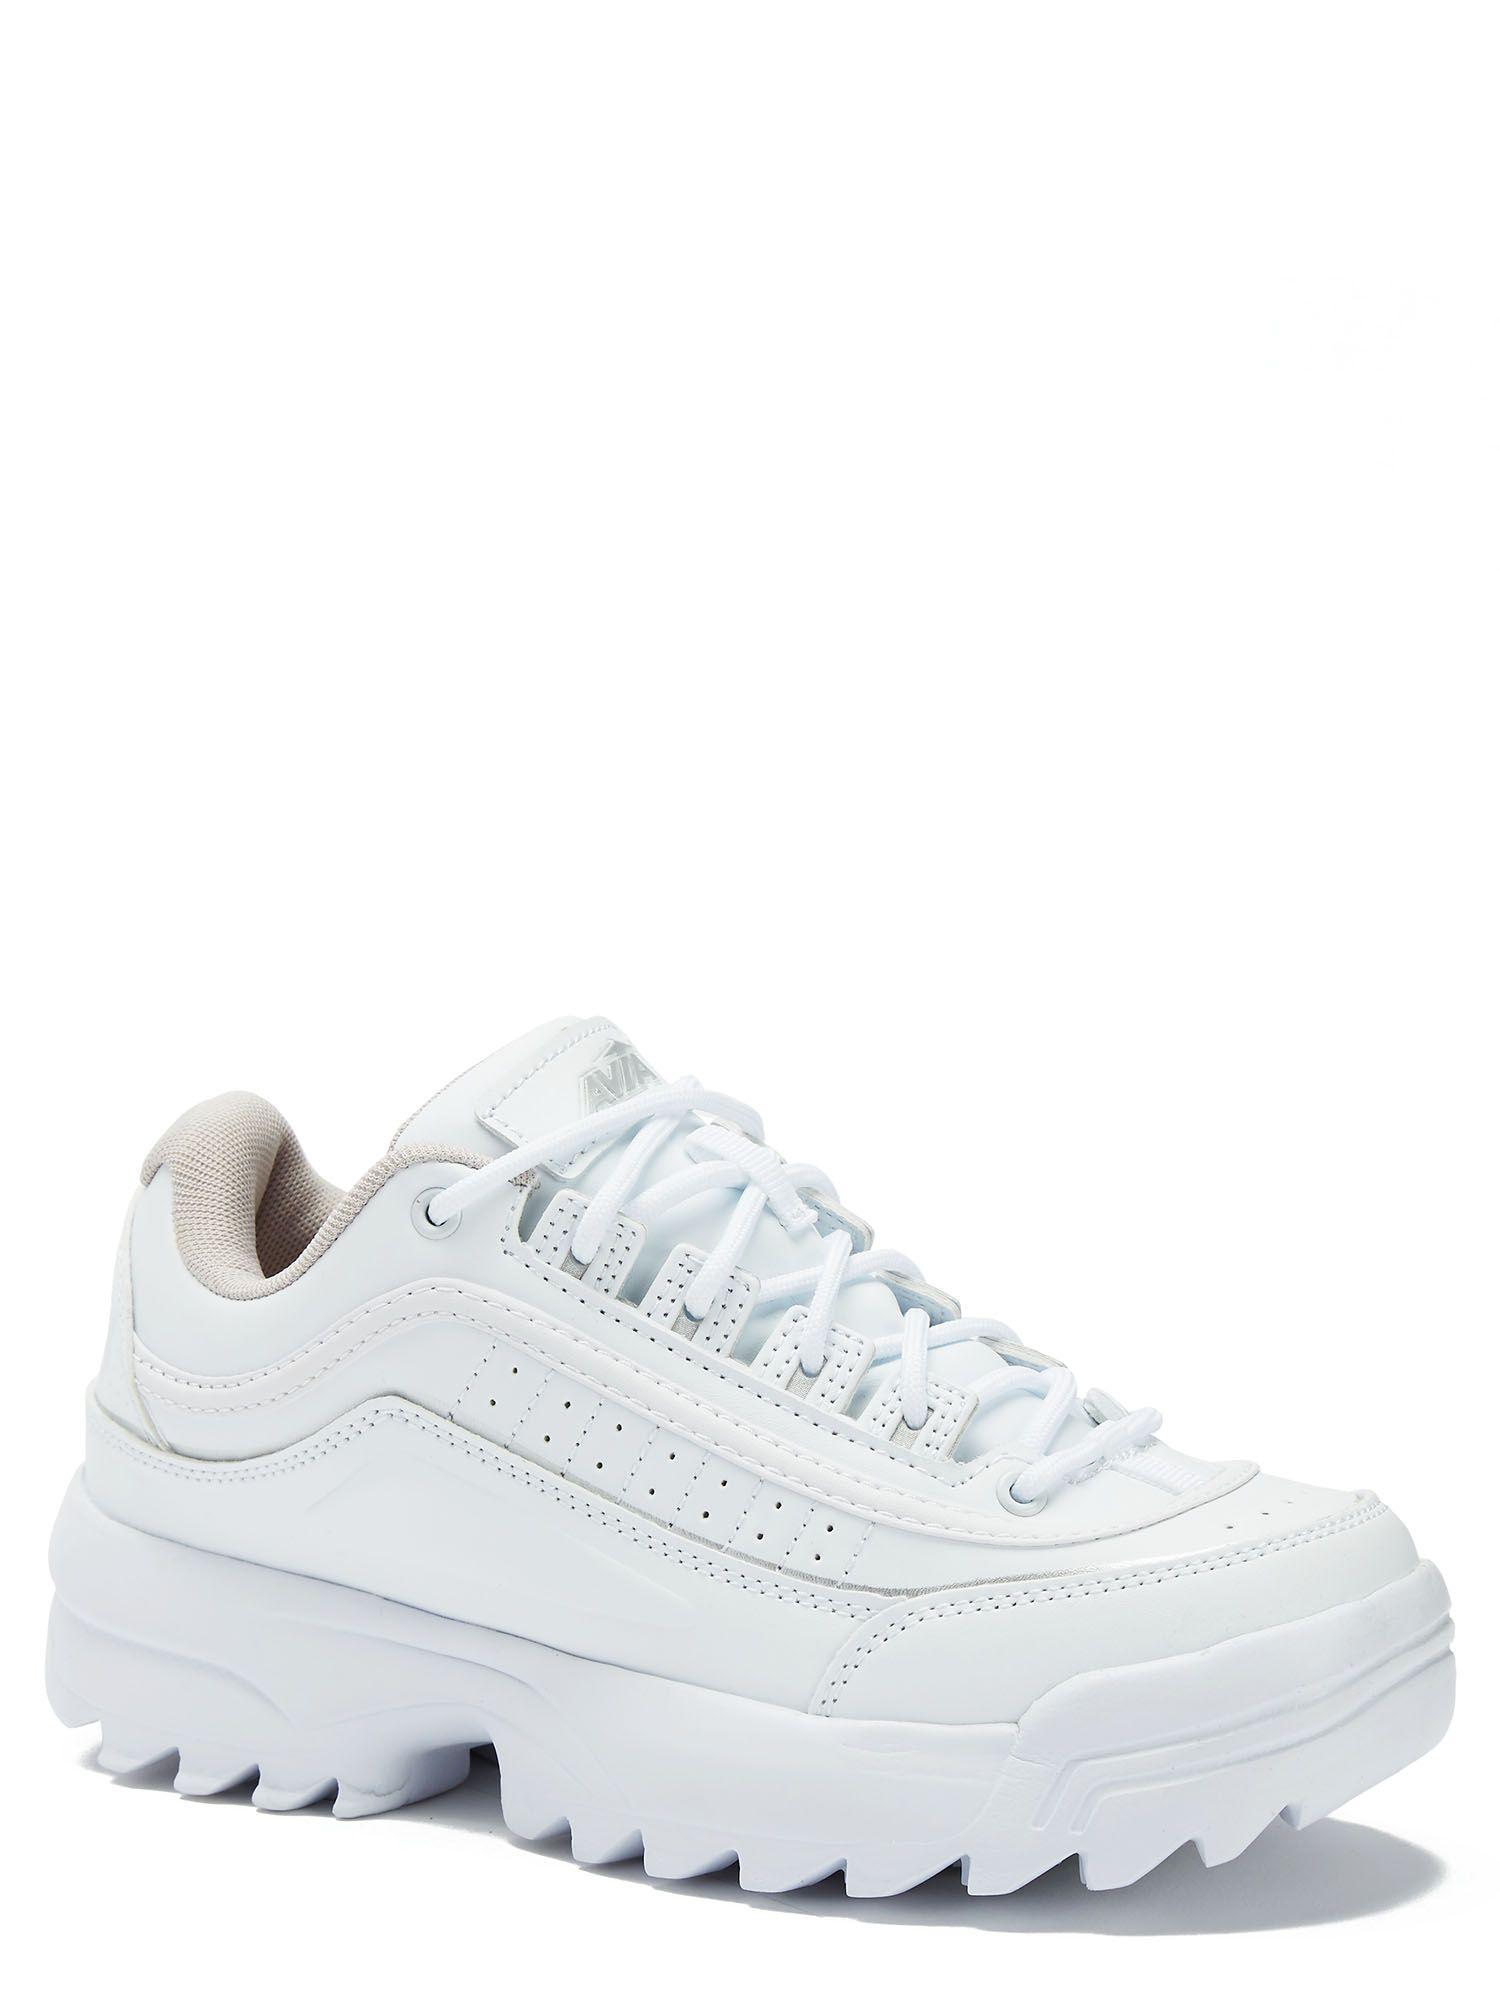 Avia Athletic Sneaker - Walmart